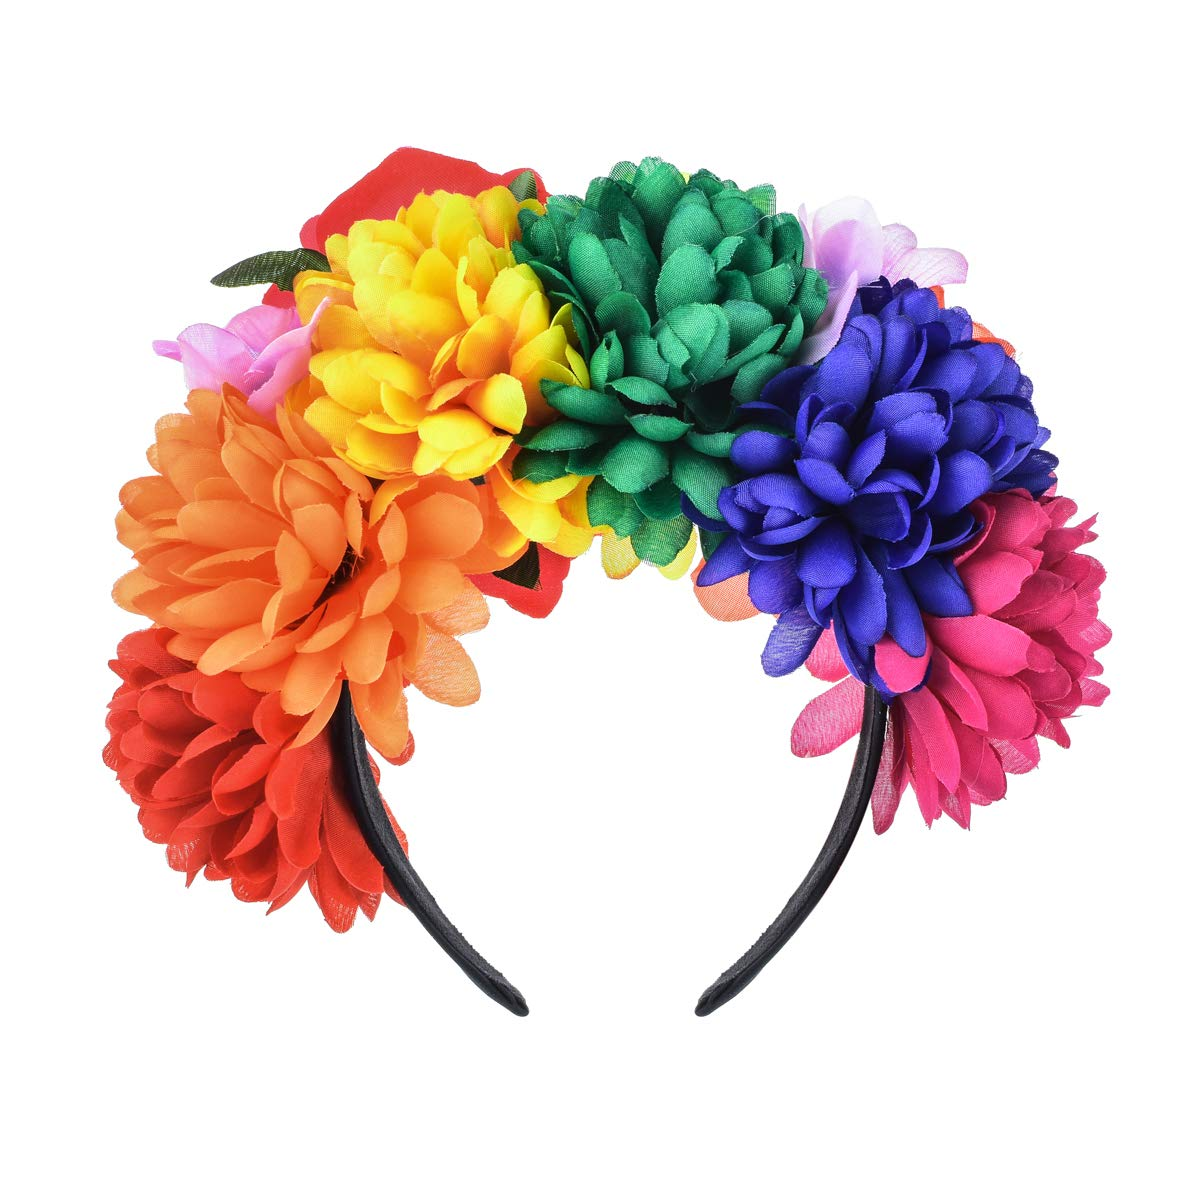 Floral Fall Day of The Dead Flower Crown Festival Headband Rose Mexican Floral Headpiece HC-23 (A-Rainbow Headband)